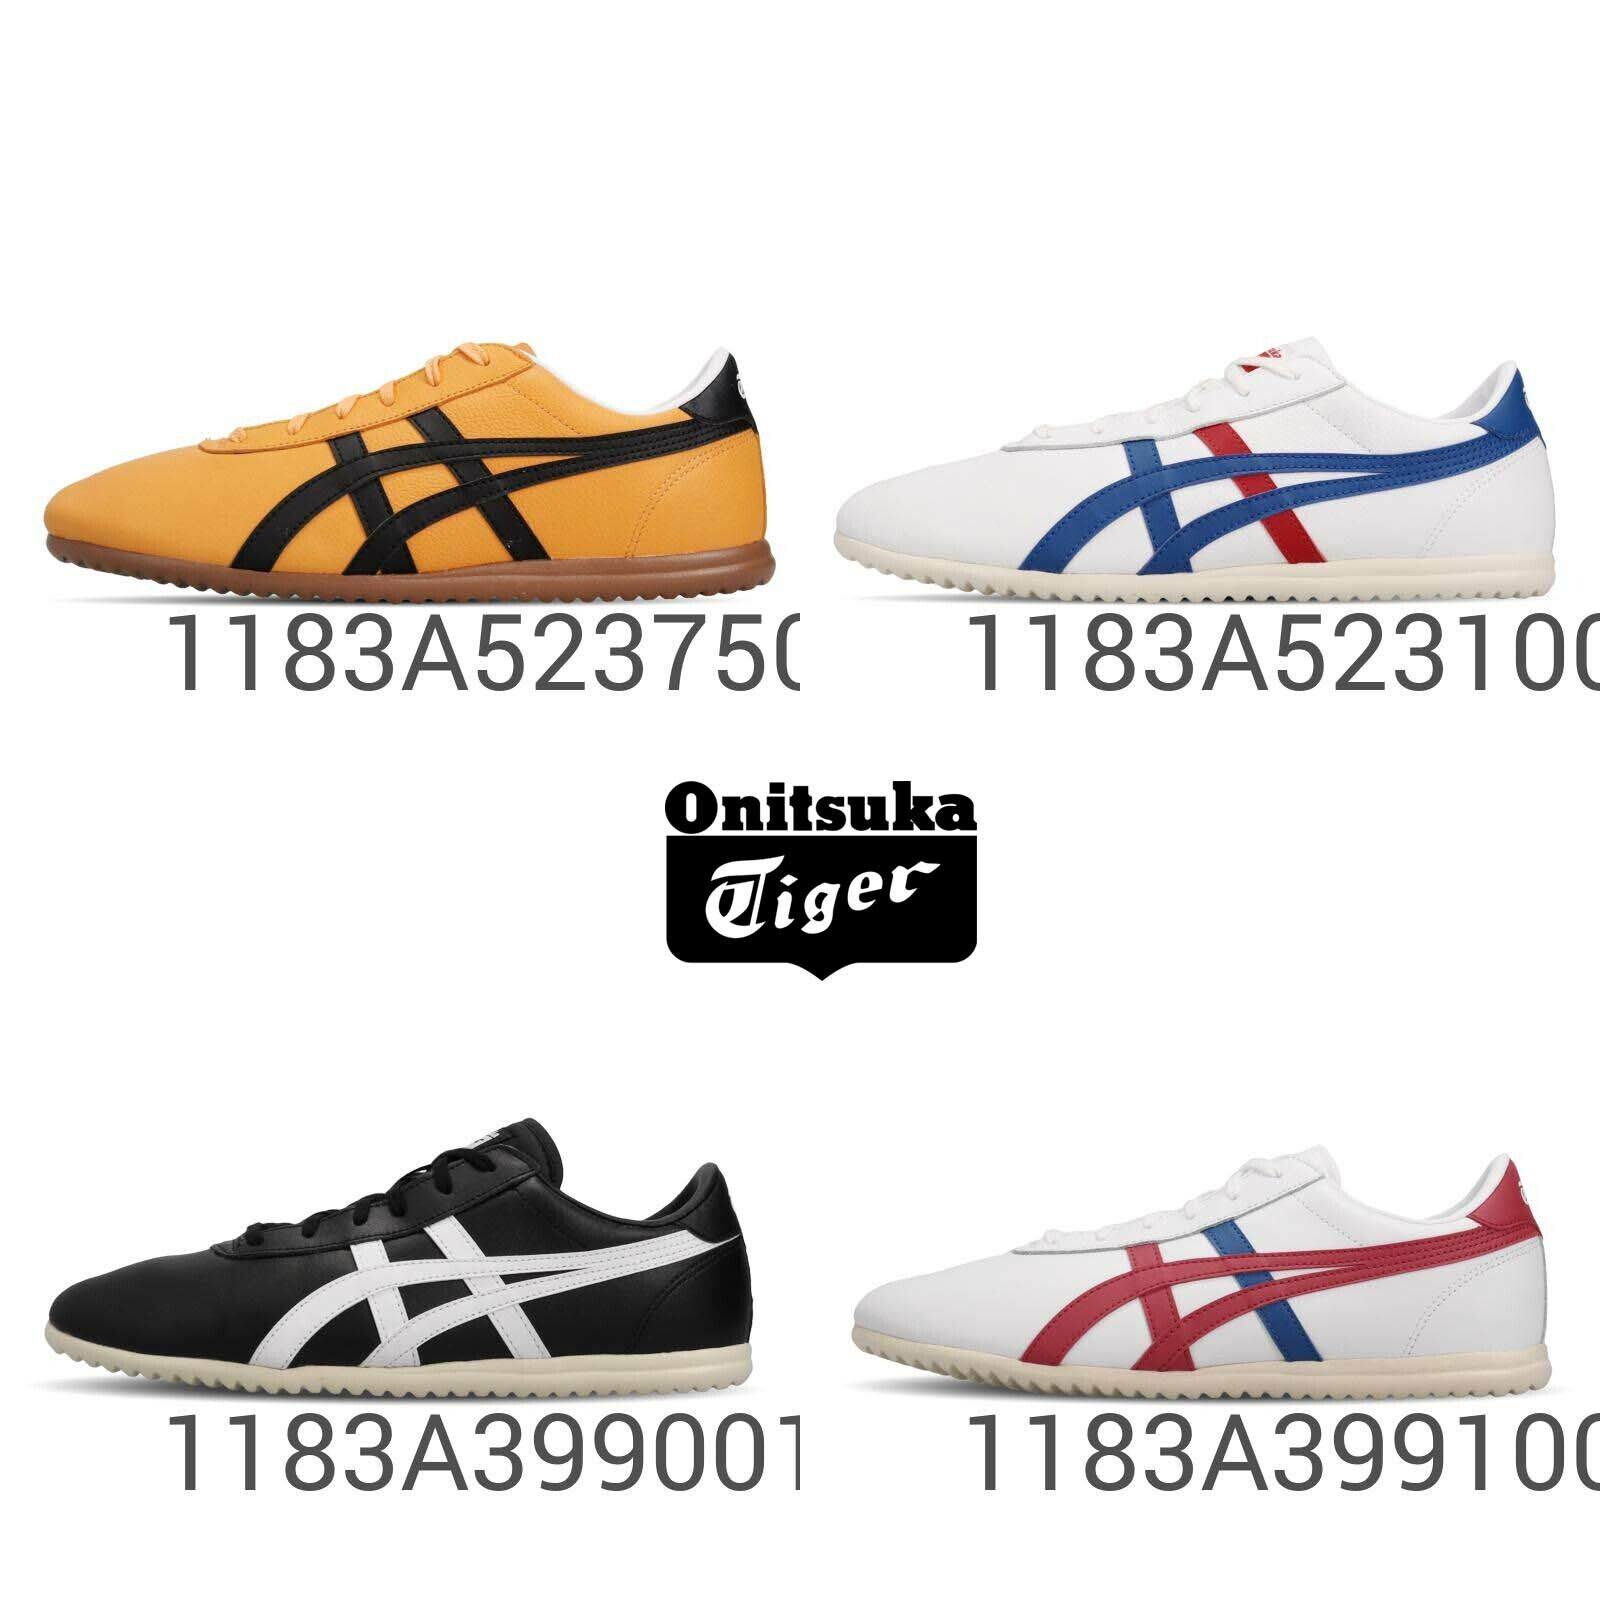 Asics Onitsuka Tiger Tai Chi Reb Mens Womens Classic Wushu Shoes Pick 1